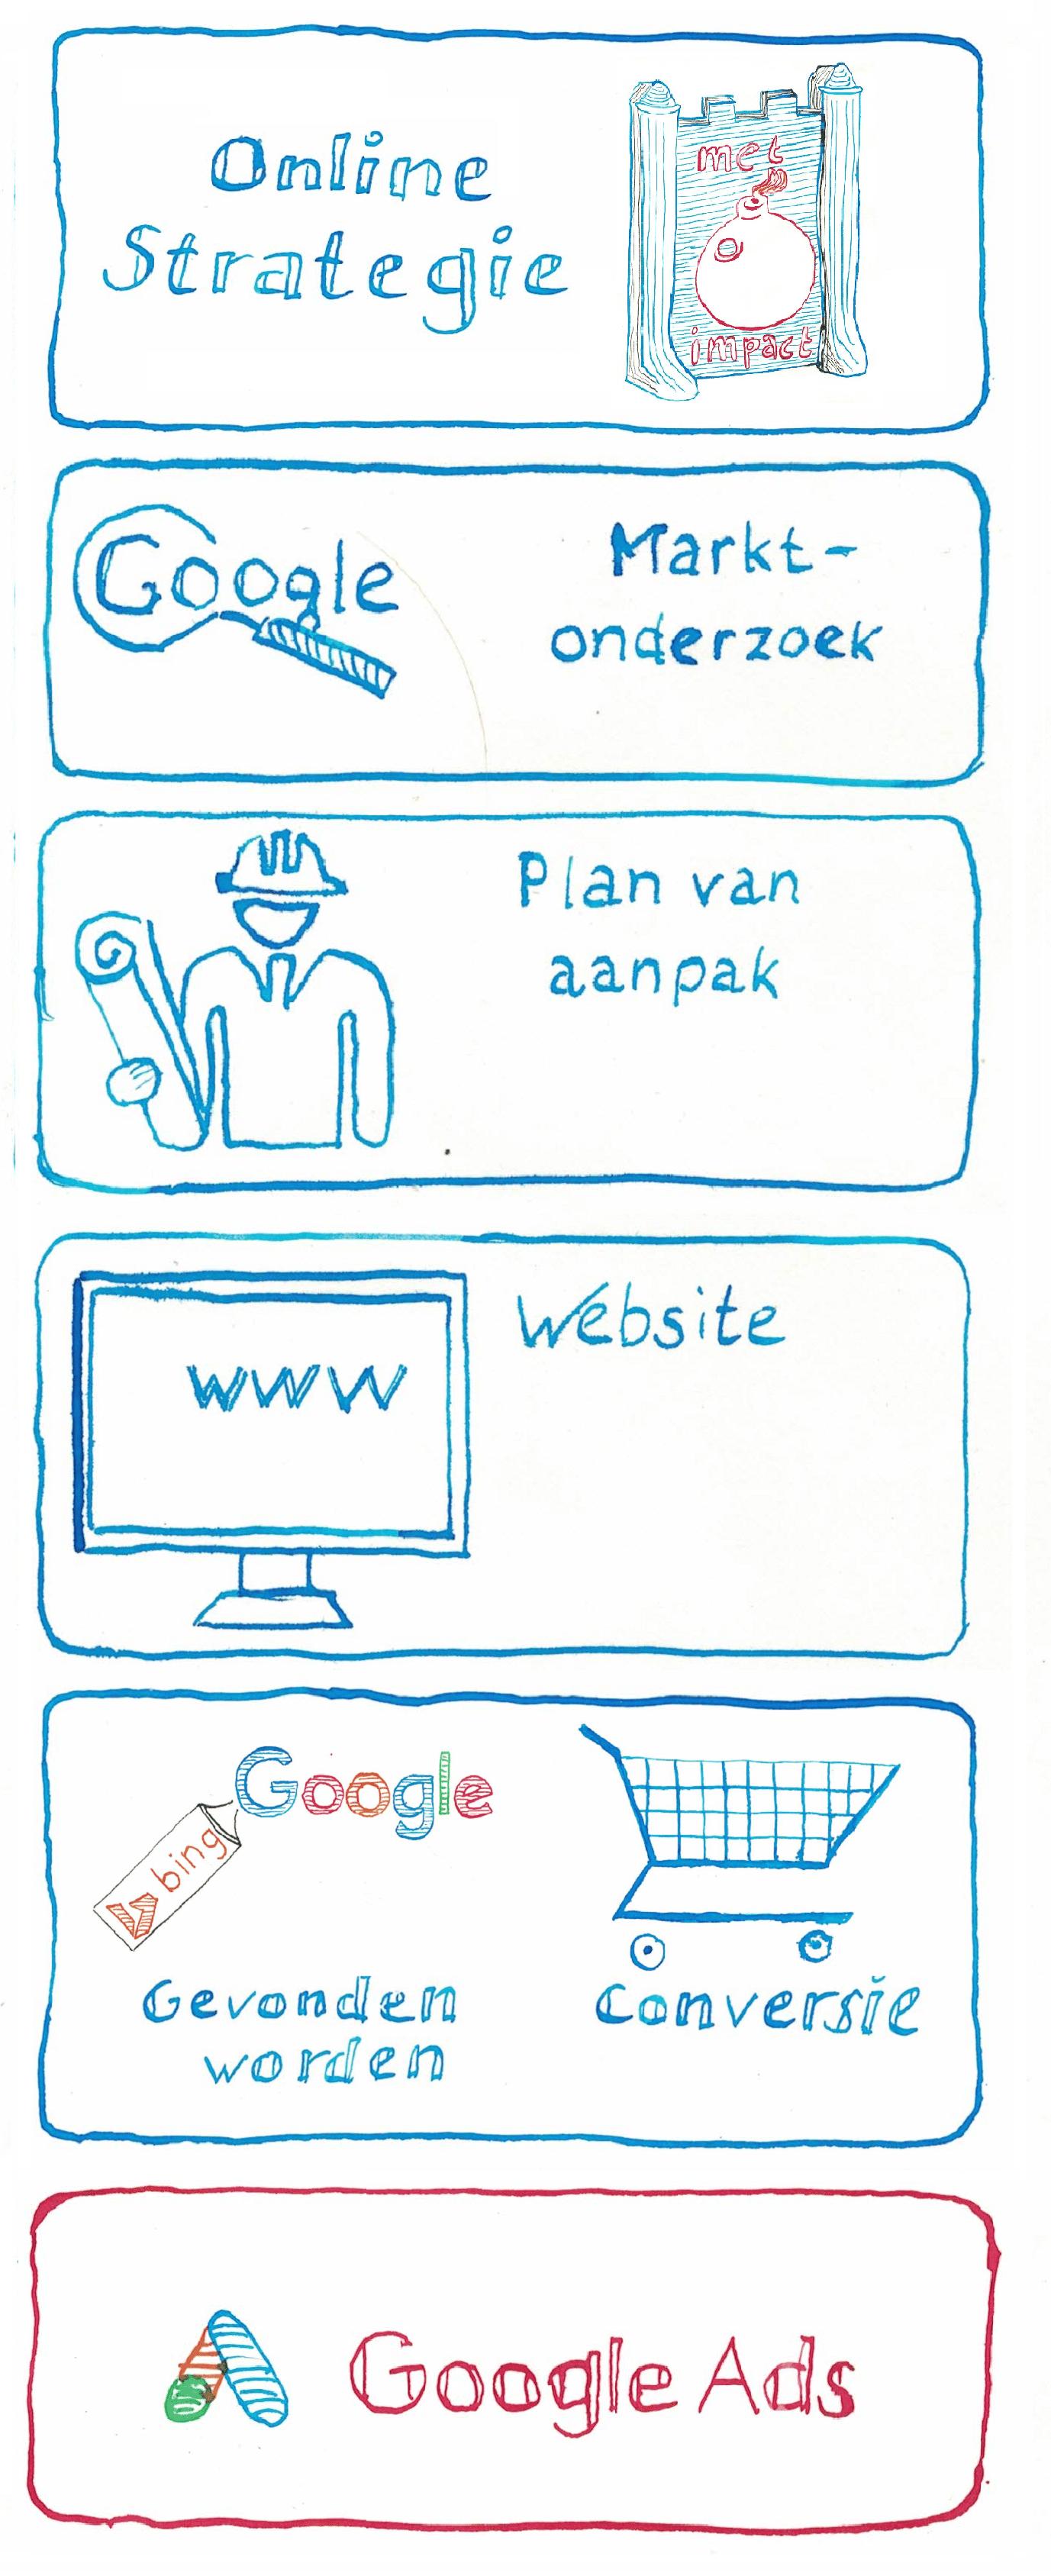 Stappenplan voor Online Succes - Google Ads -JXR SEM